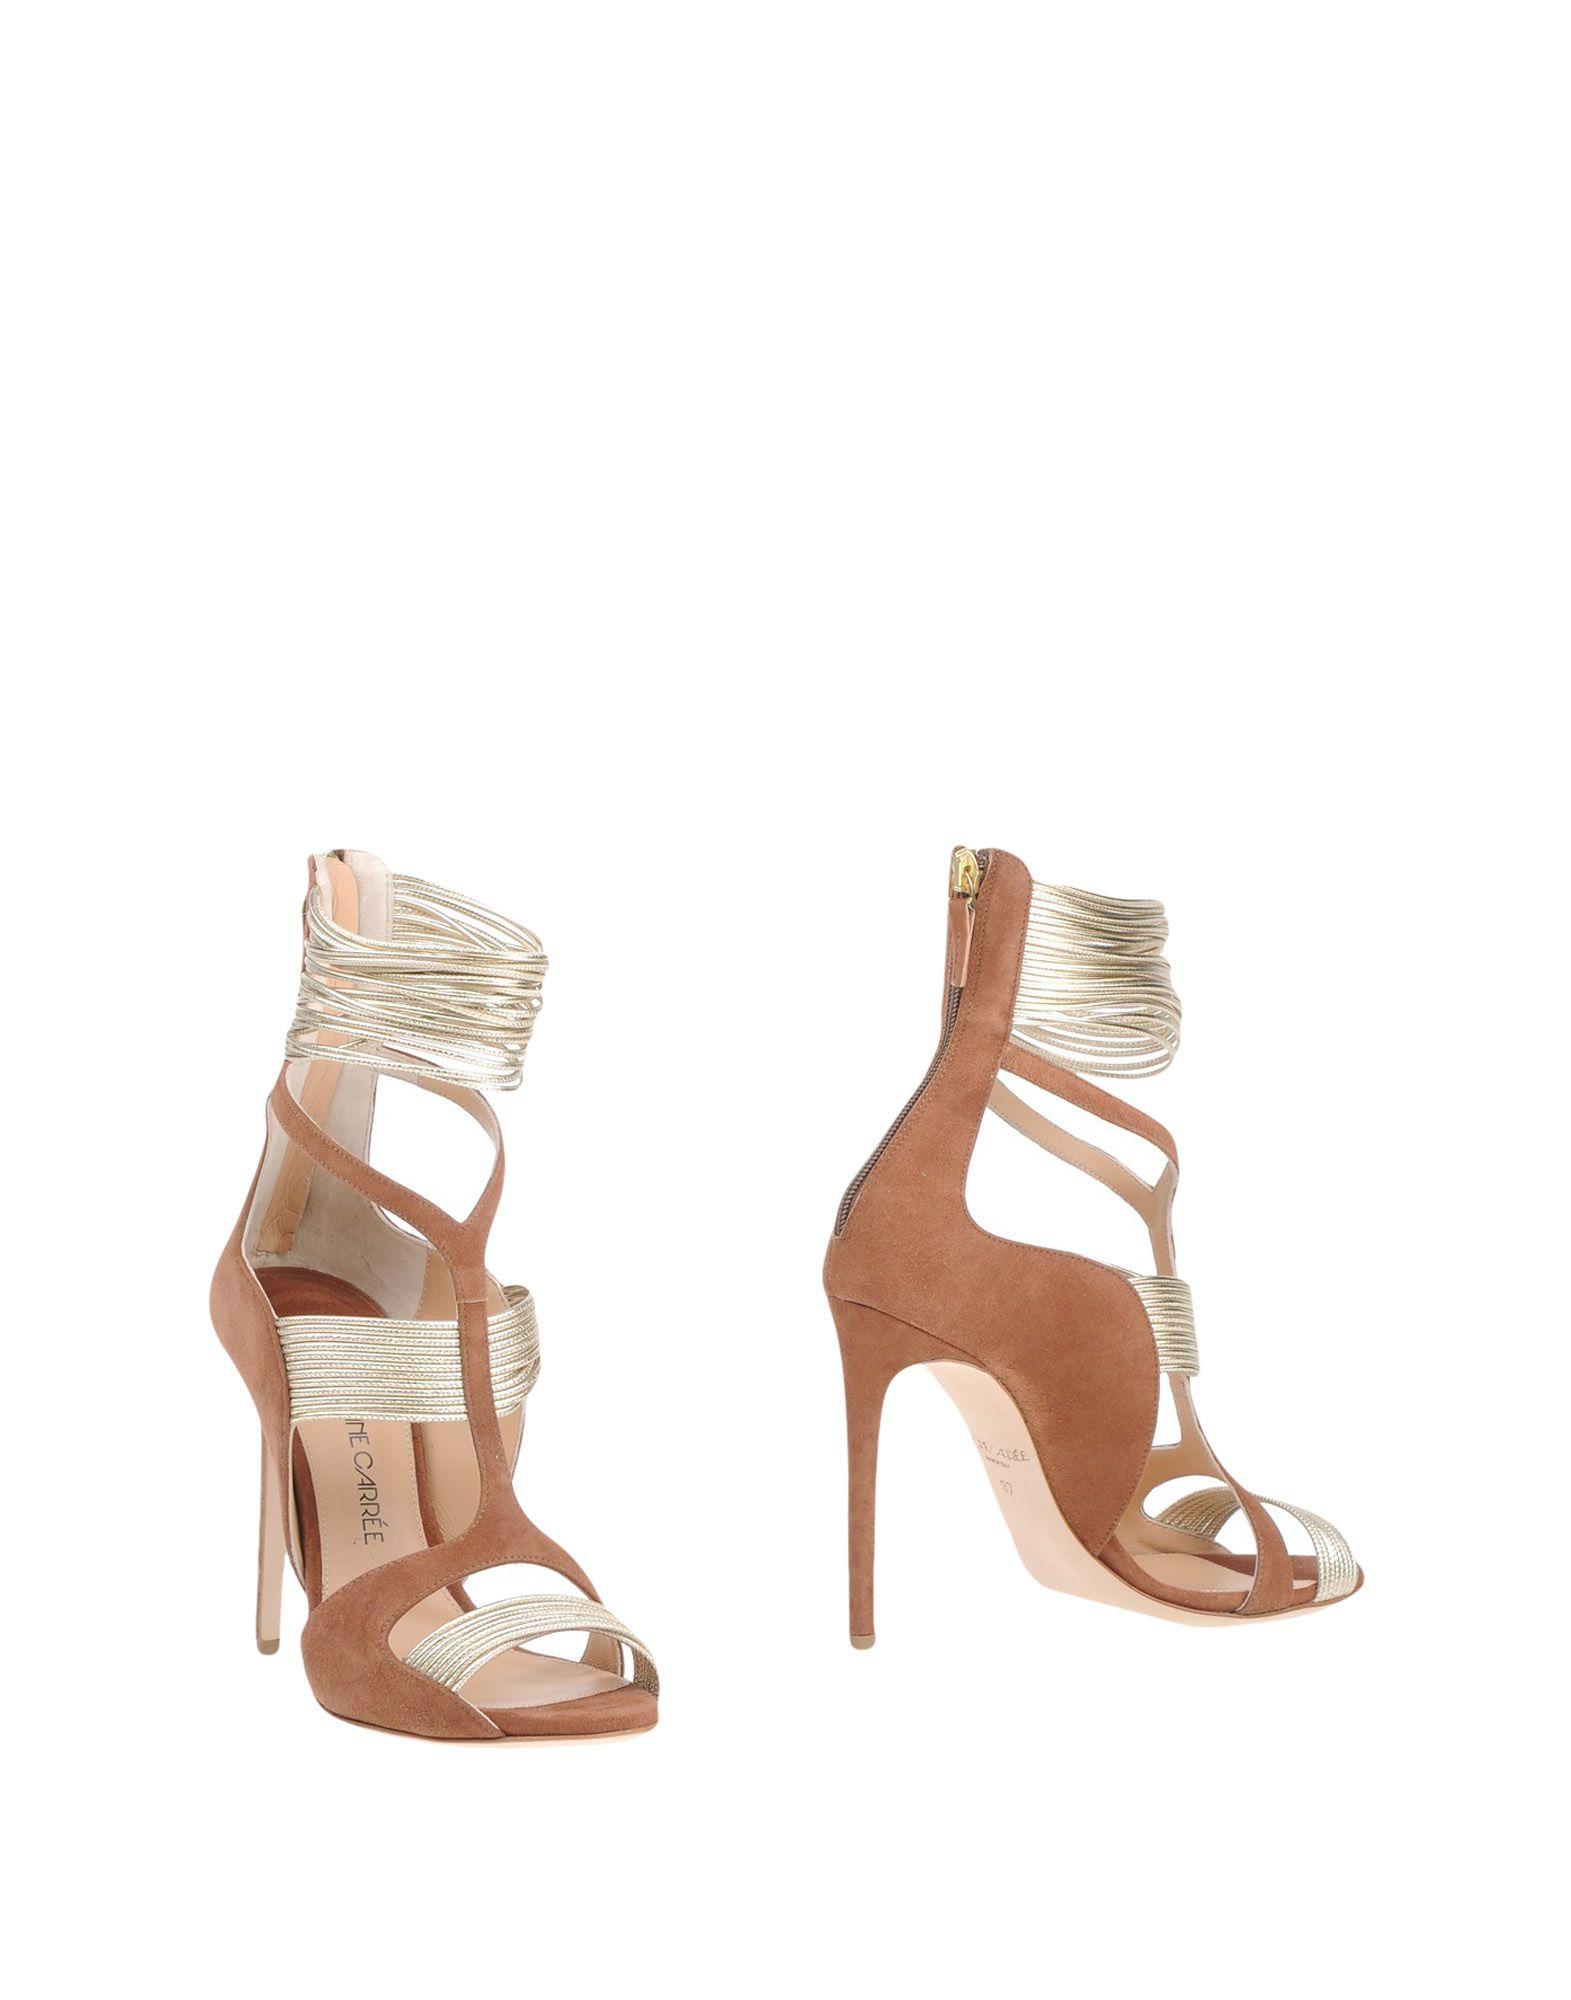 Stilvolle billige Stiefelette Schuhe Racine Carrée Stiefelette billige Damen  11332382LX 153d0f